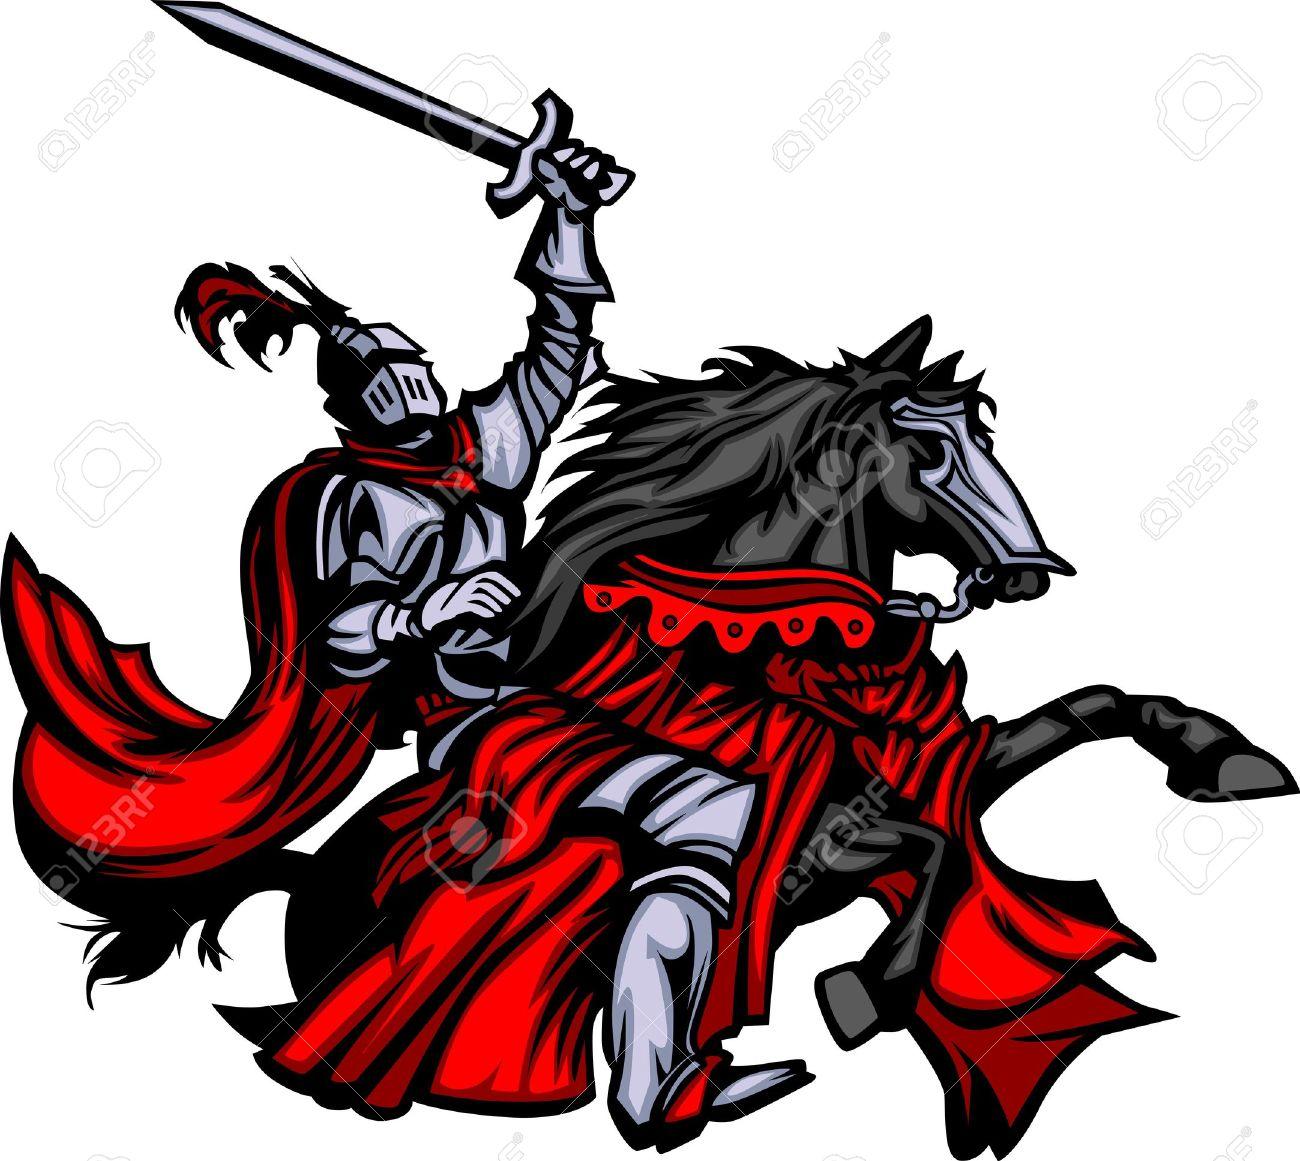 Knight Mascot on Horse Stock Vector - 10282026